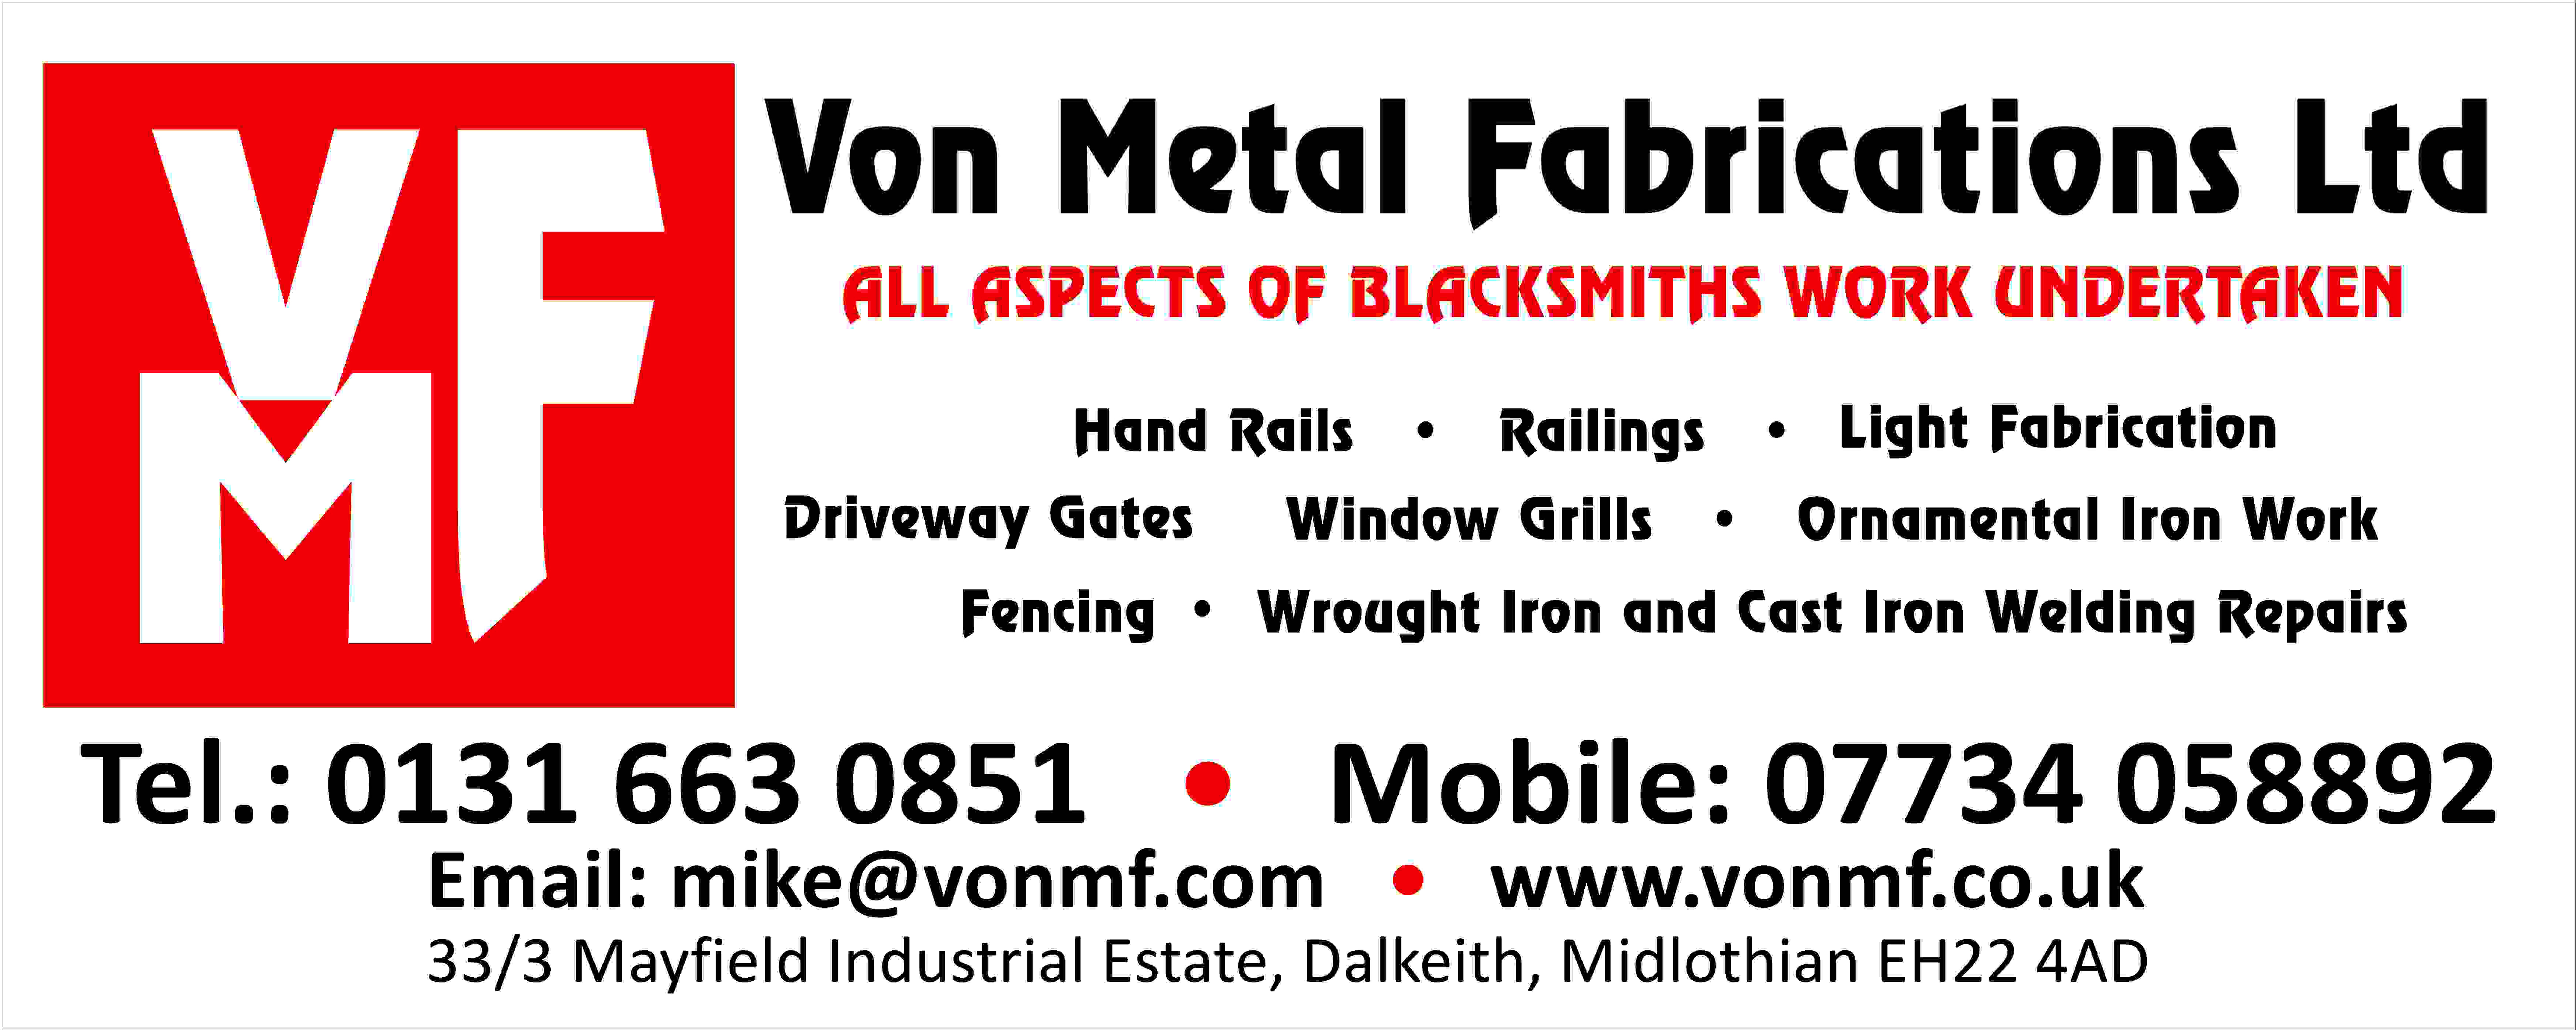 Von Metal Fabrications